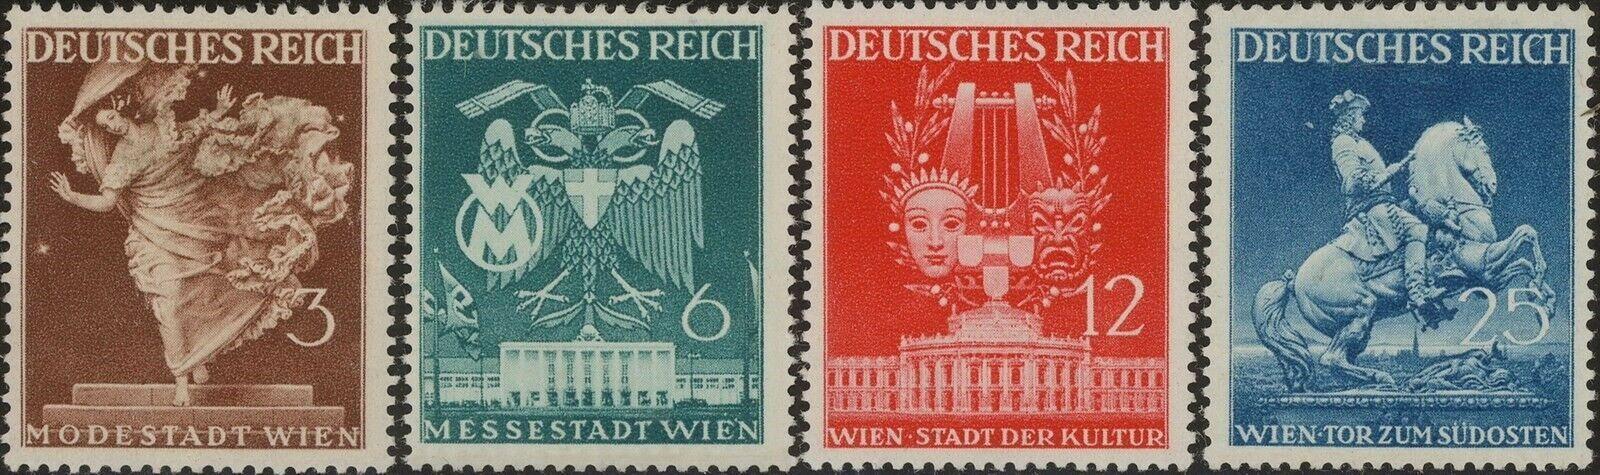 Germany502 05